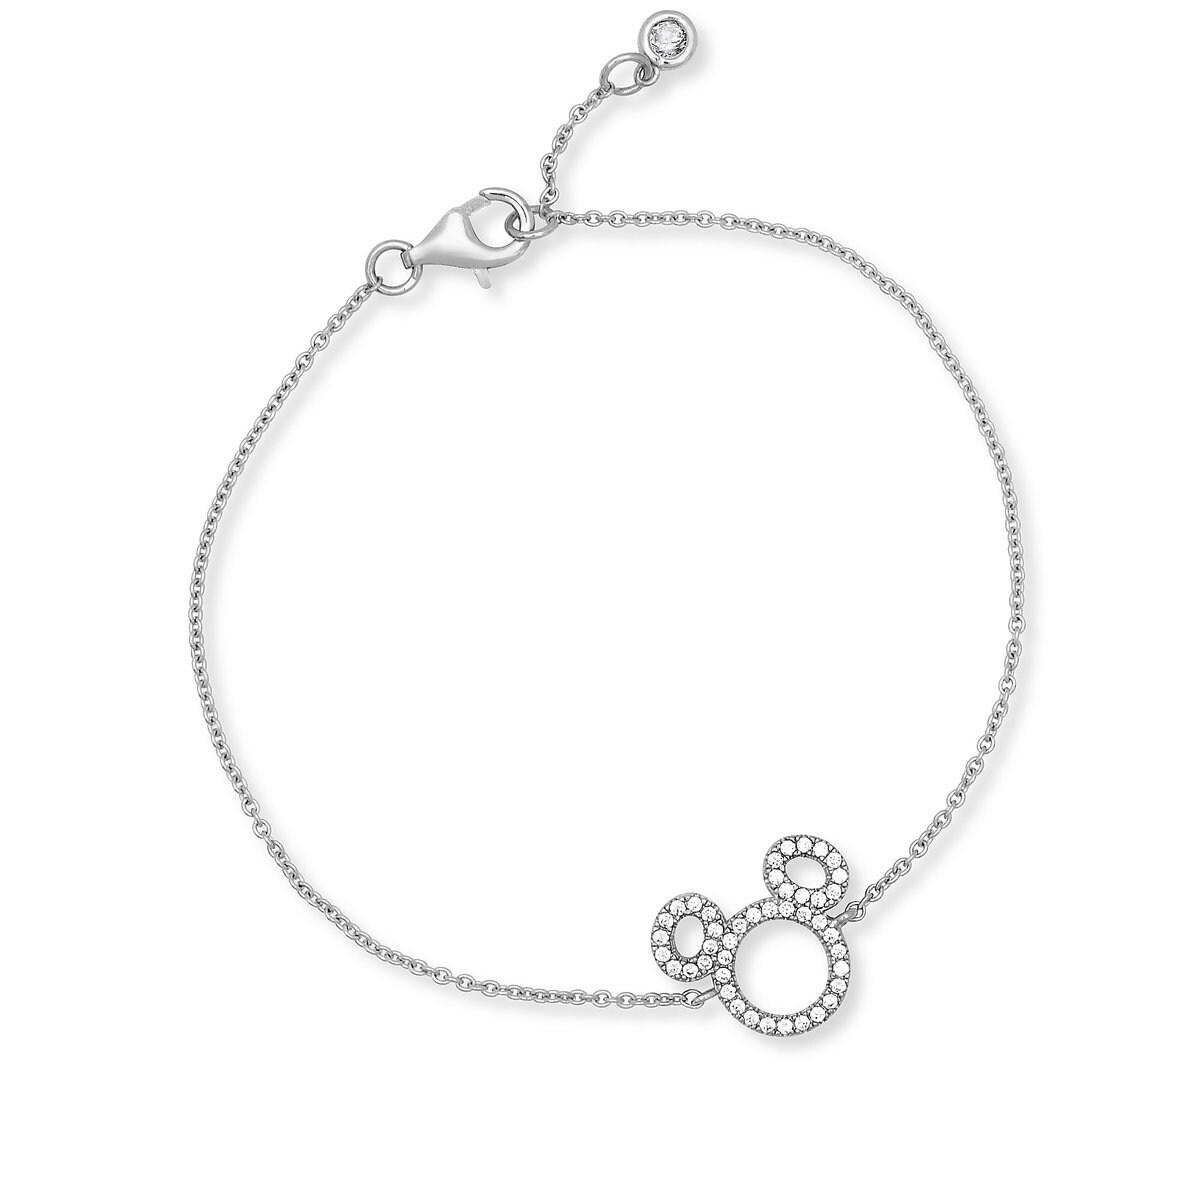 7774e4a2e Product Image of Mickey Mouse Icon Silhouette Bracelet by CRISLU - Platinum  # 1